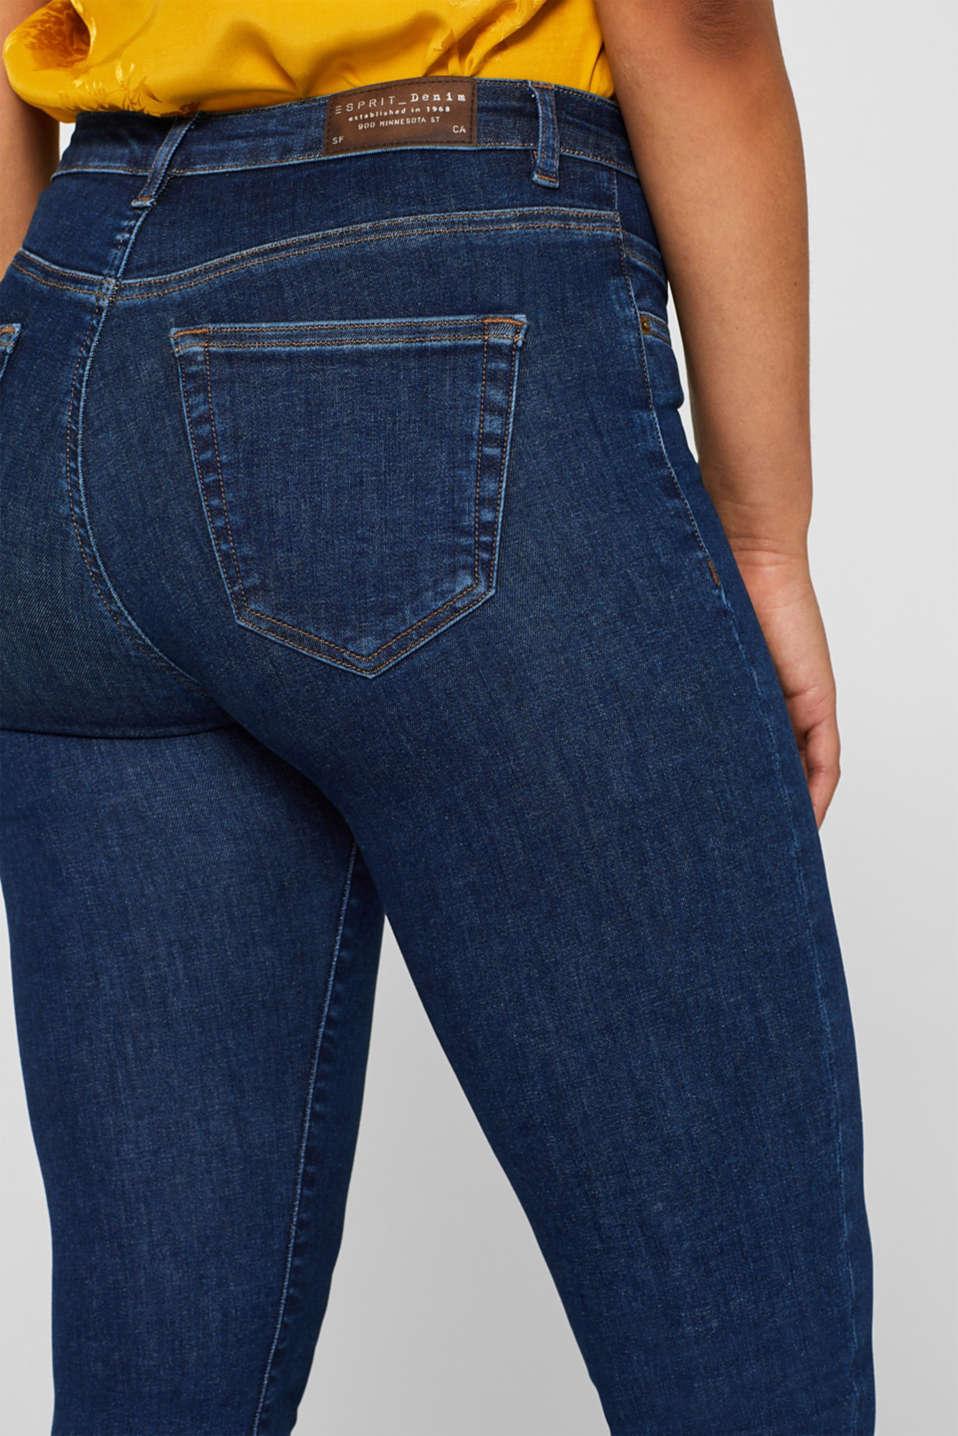 Pants denim, BLUE MEDIUM WASH, detail image number 2